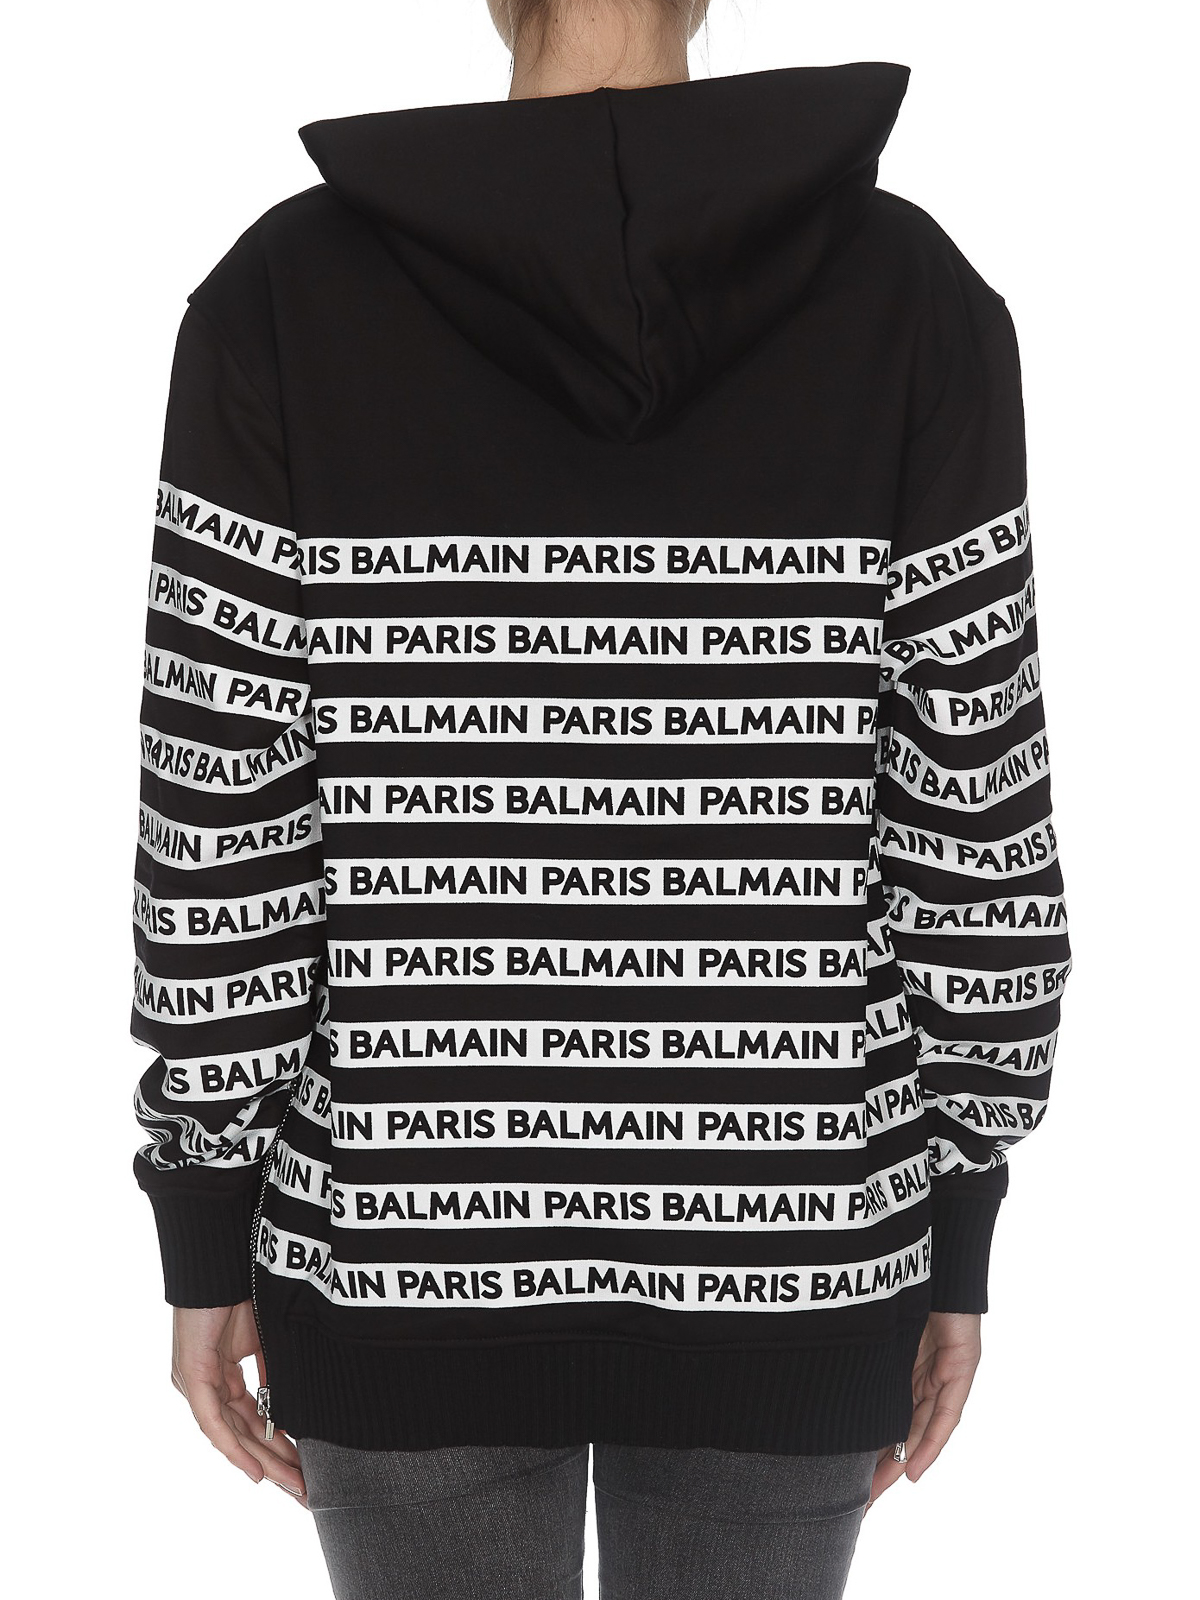 92c8a1c42290 Balmain - Felpa in cotone nero con logo all over - Felpe e maglie ...